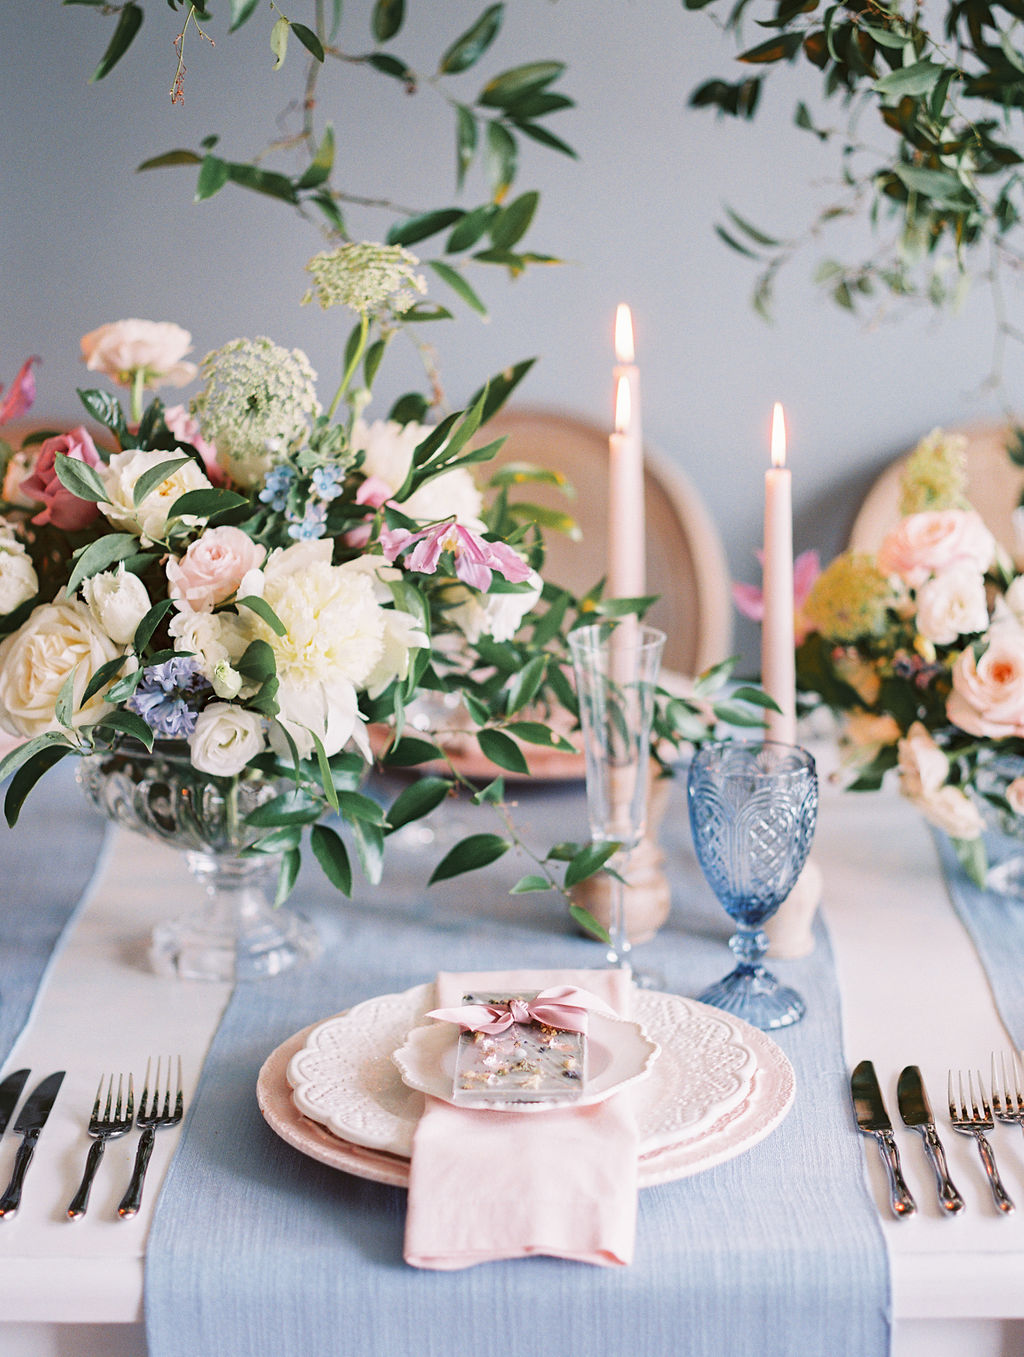 Romantic-French-Garden-WhitneyHeardPhotography-6011138-R1-E003